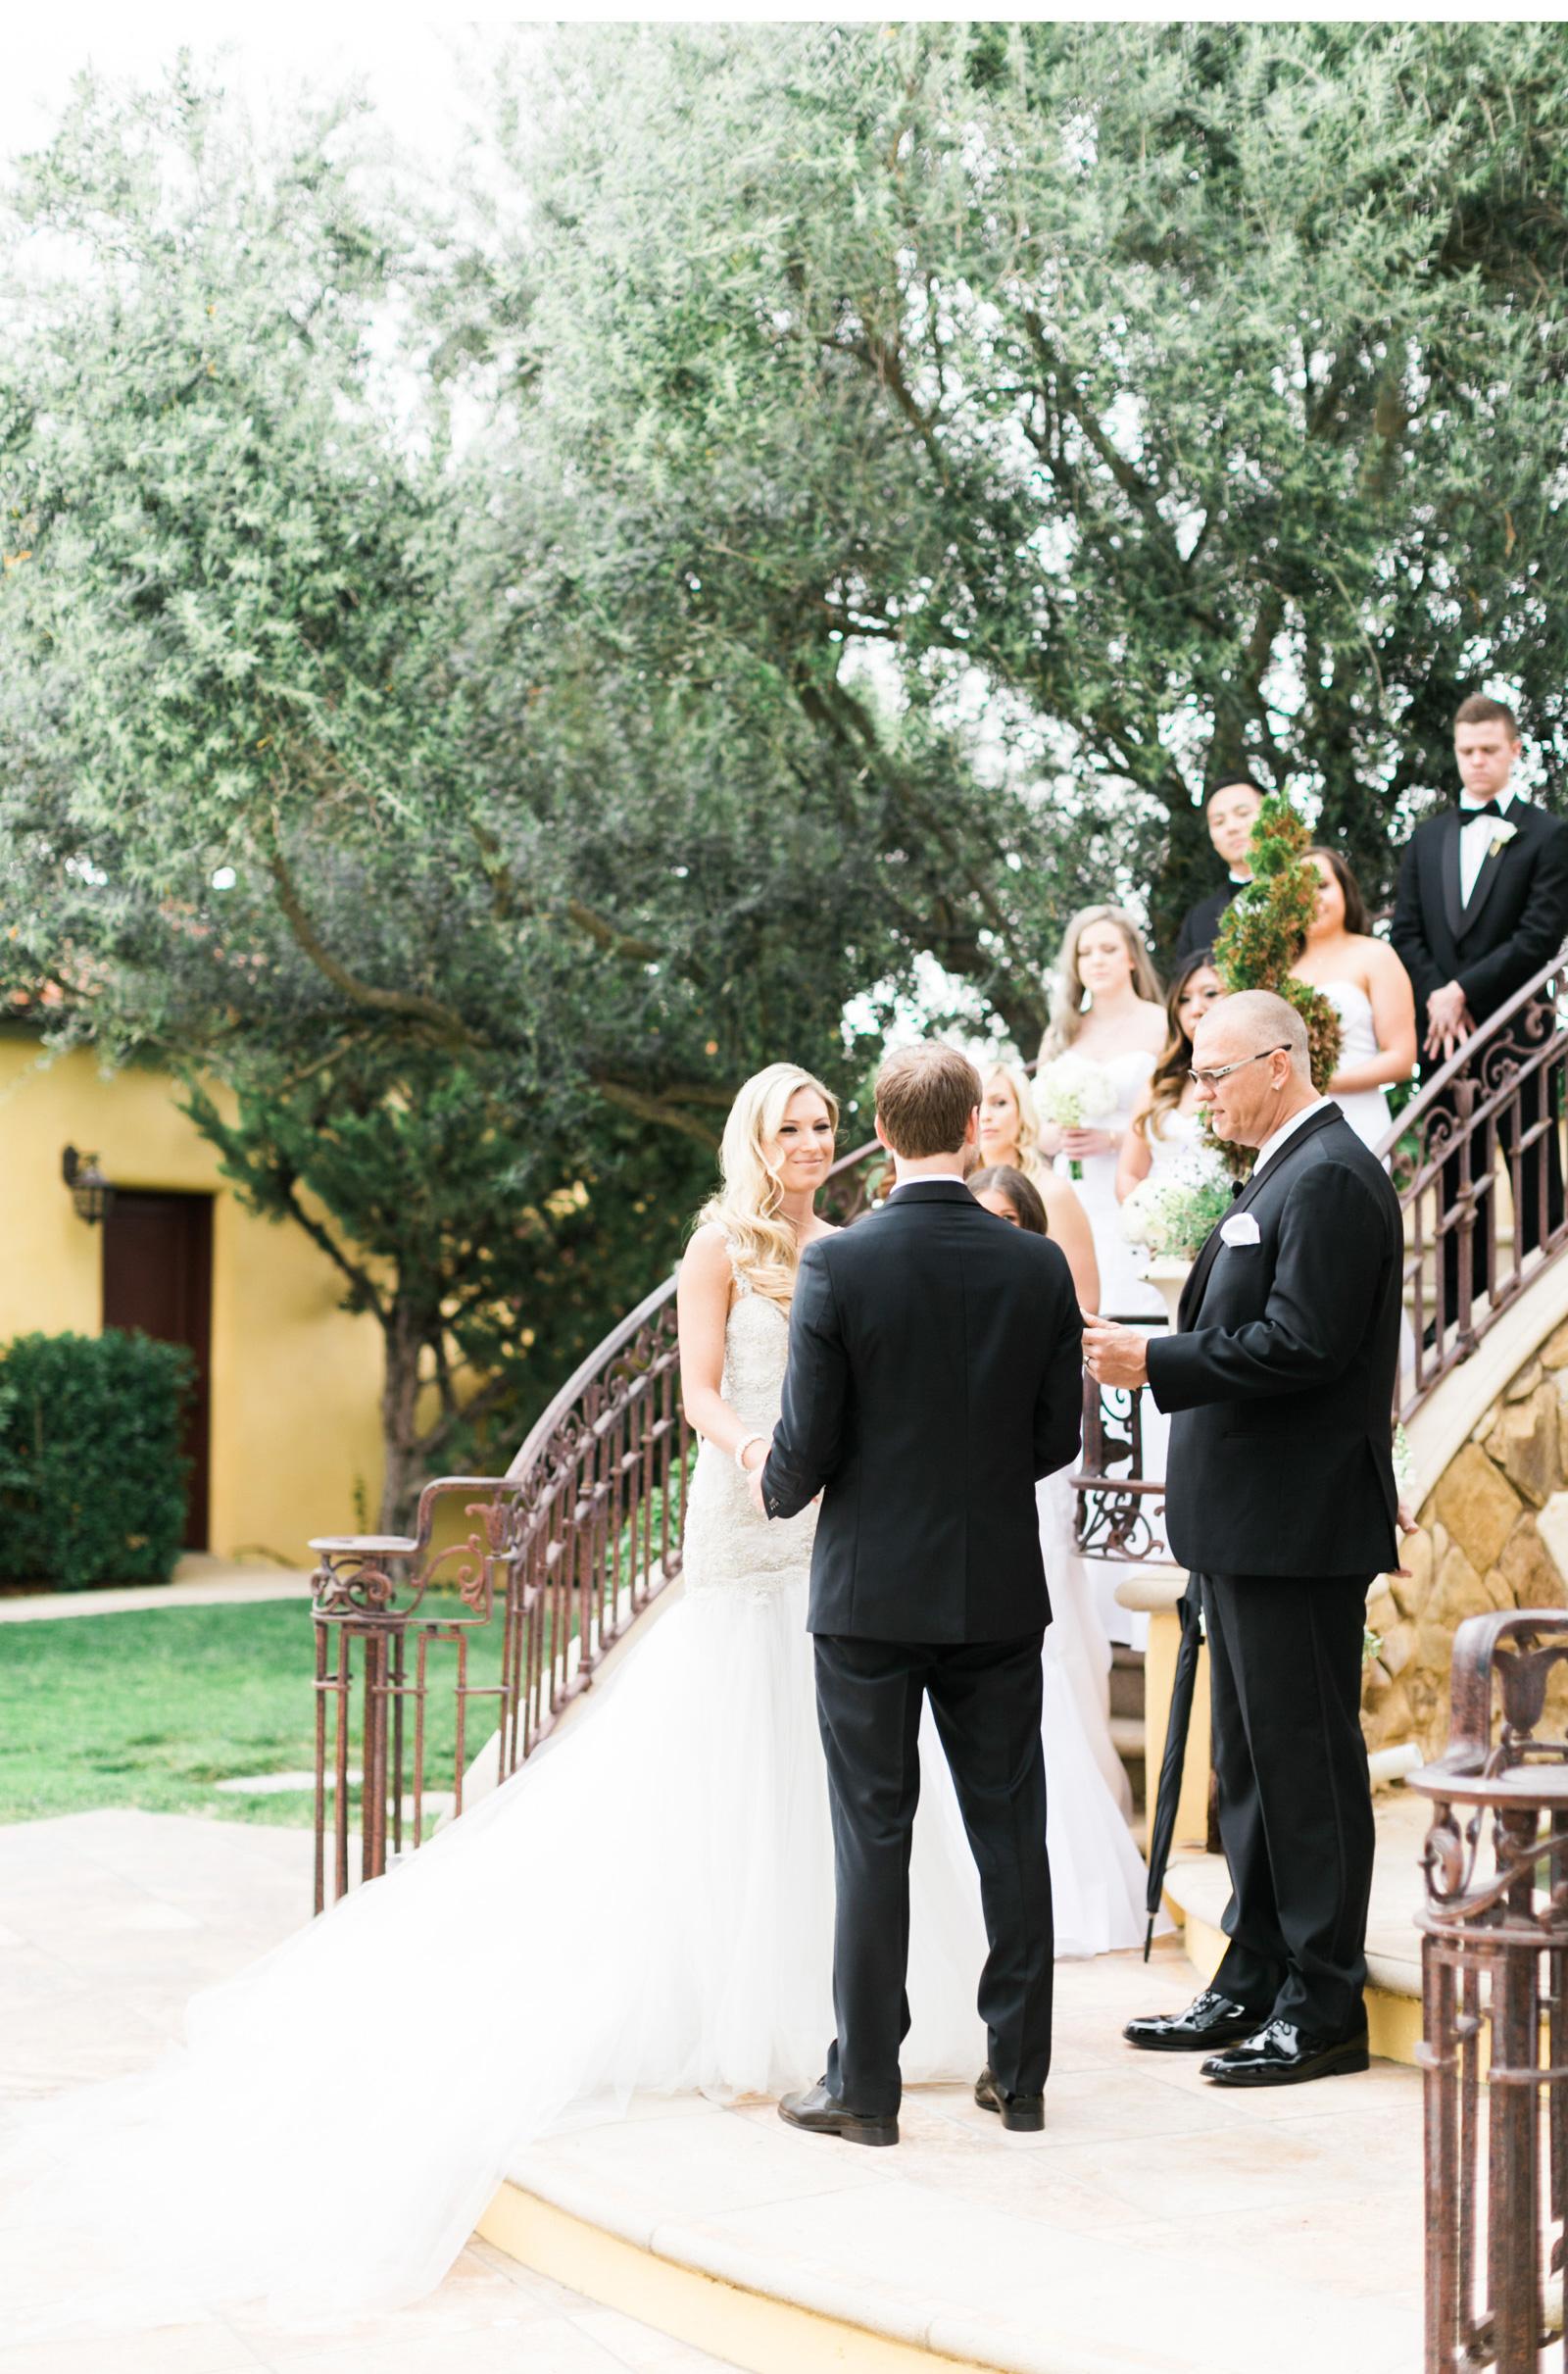 Style-Me-Pretty-Vineyard-Wedding-Natalie-Schutt-Photography_01.jpg